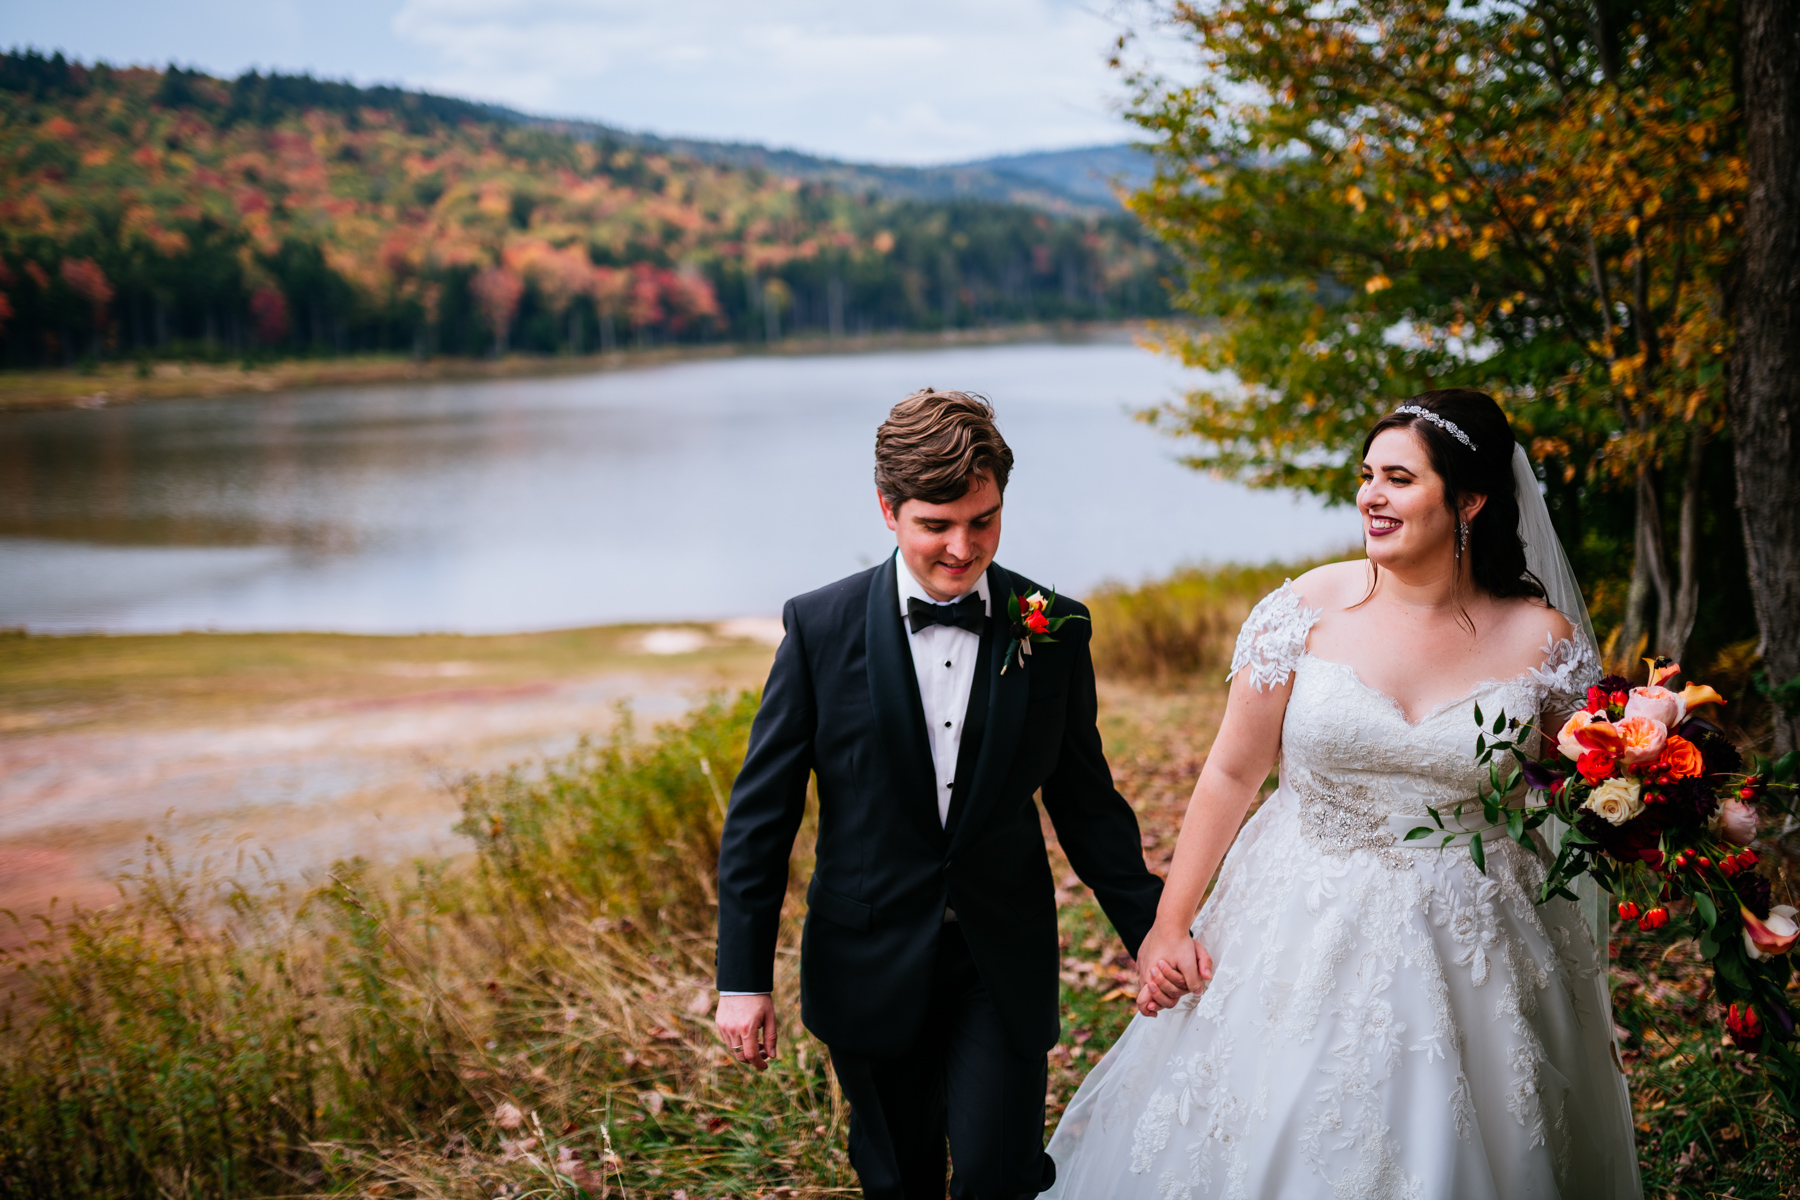 bride and groom walking snowshoe mountain resort wedding